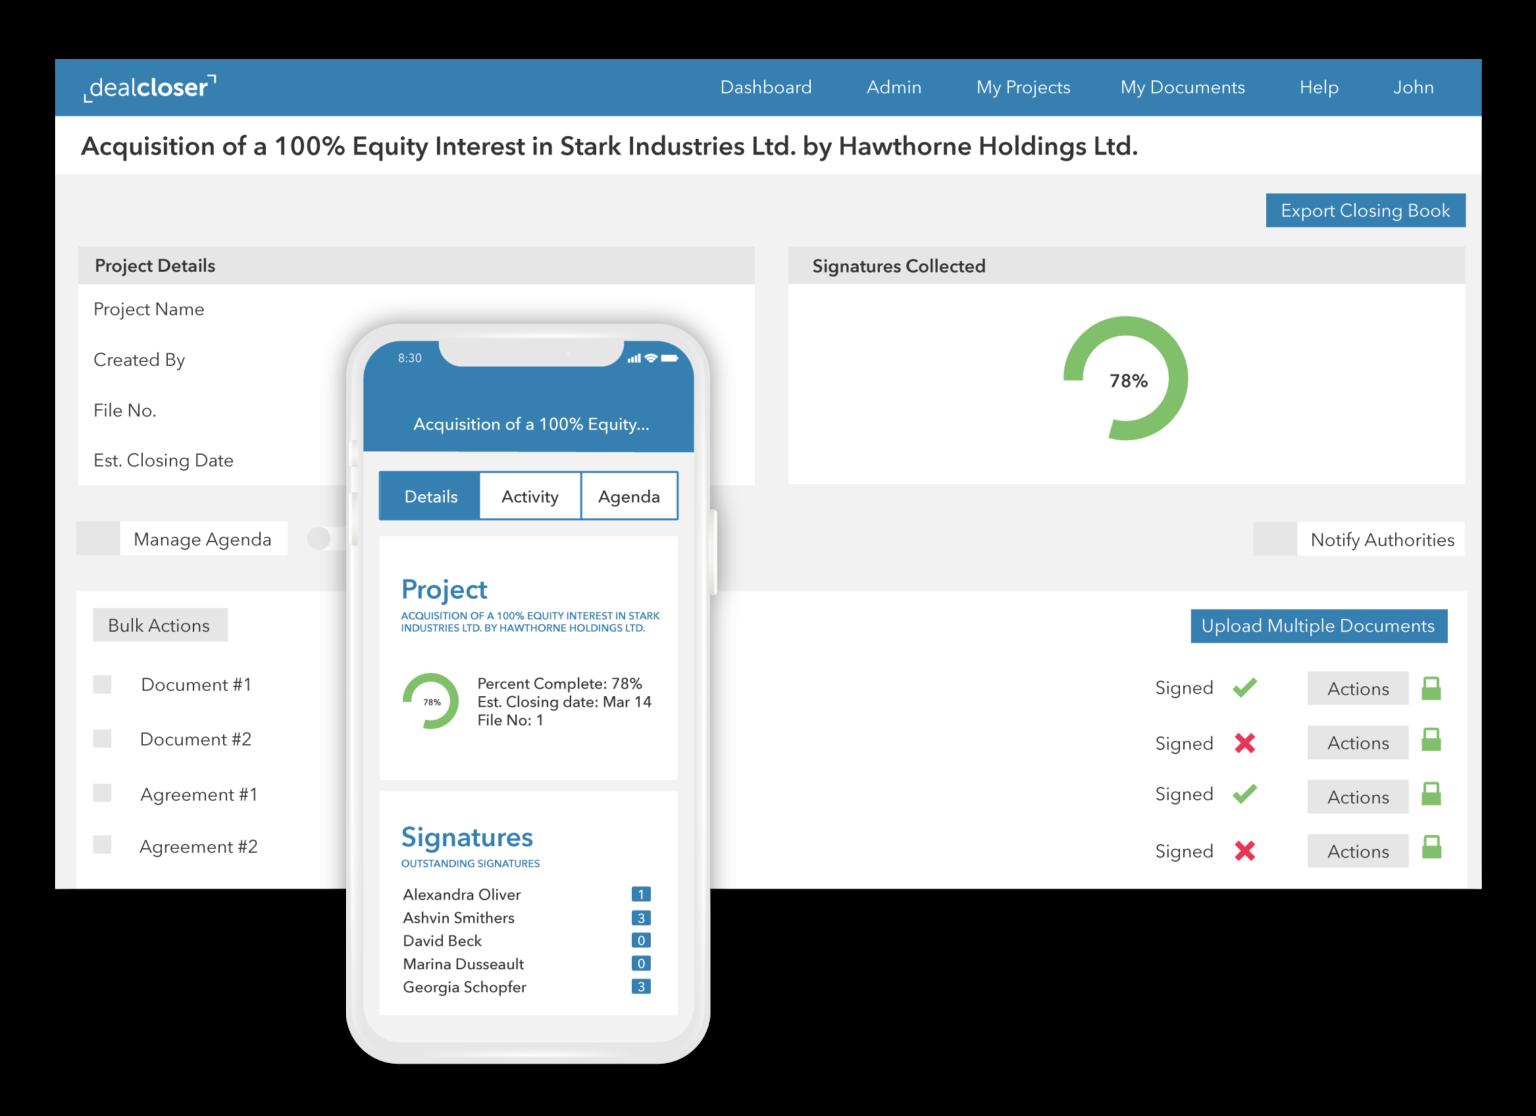 dealcloser desktop and mobile app showing transaction progress